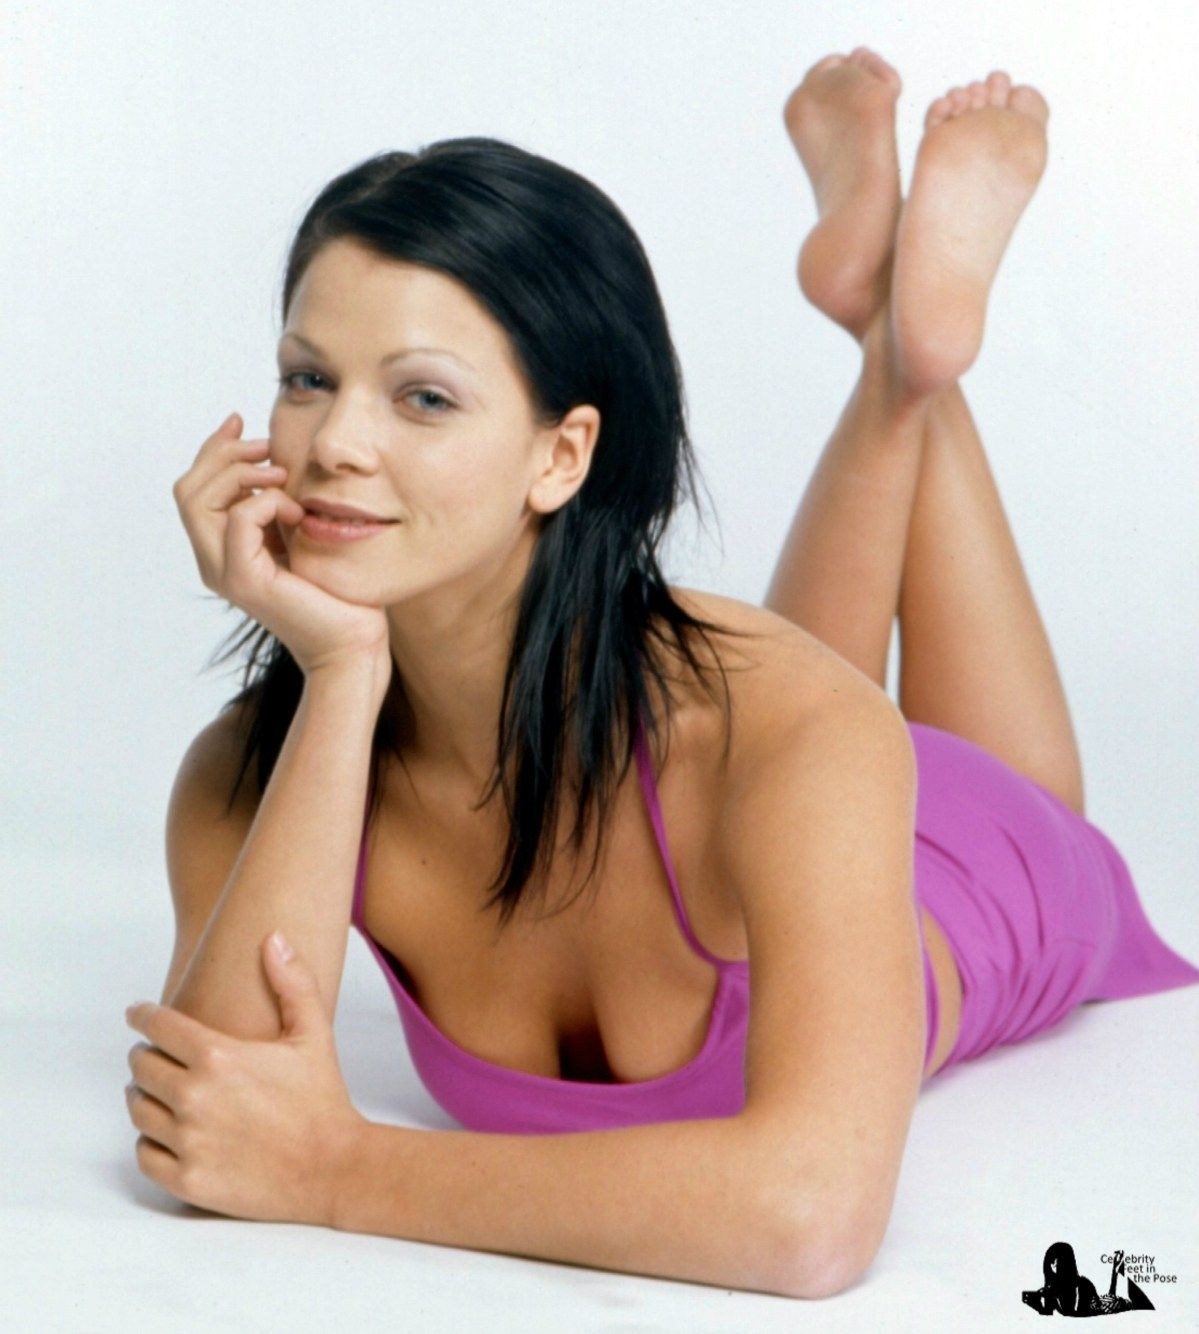 German actress Jessica Schwarz | Germany | Actress jessica ...